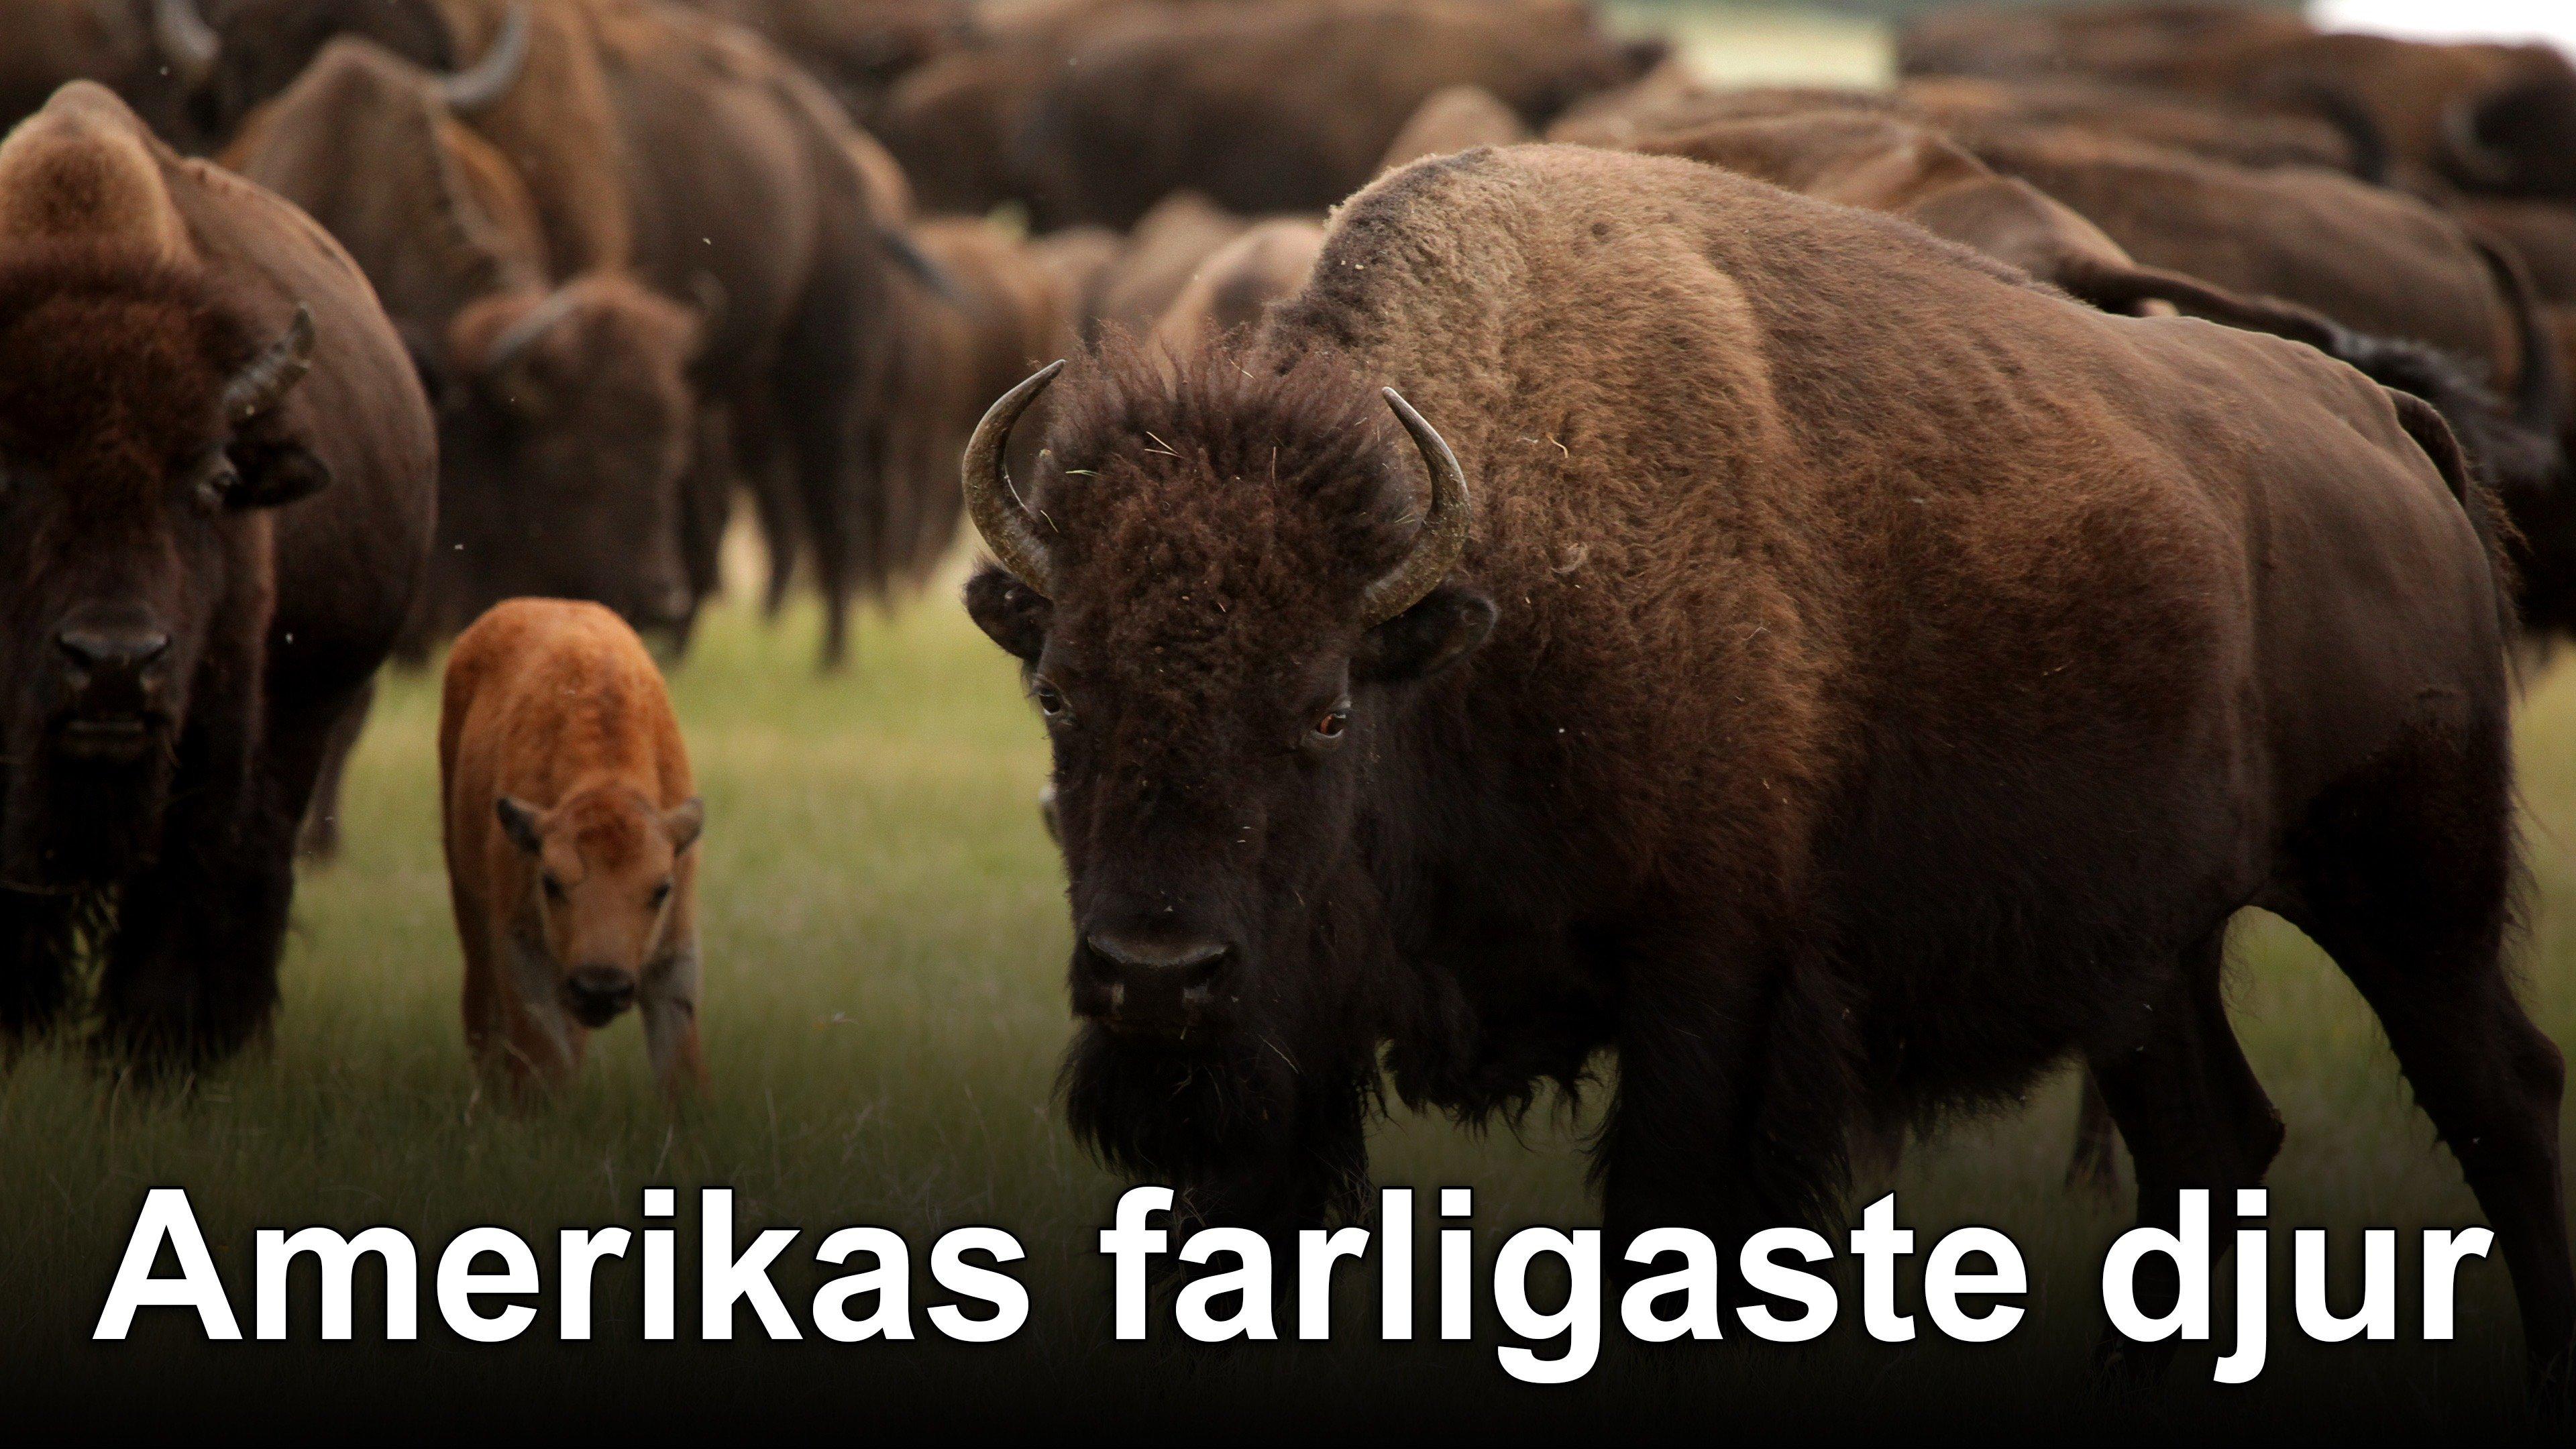 Amerikas farligaste djur